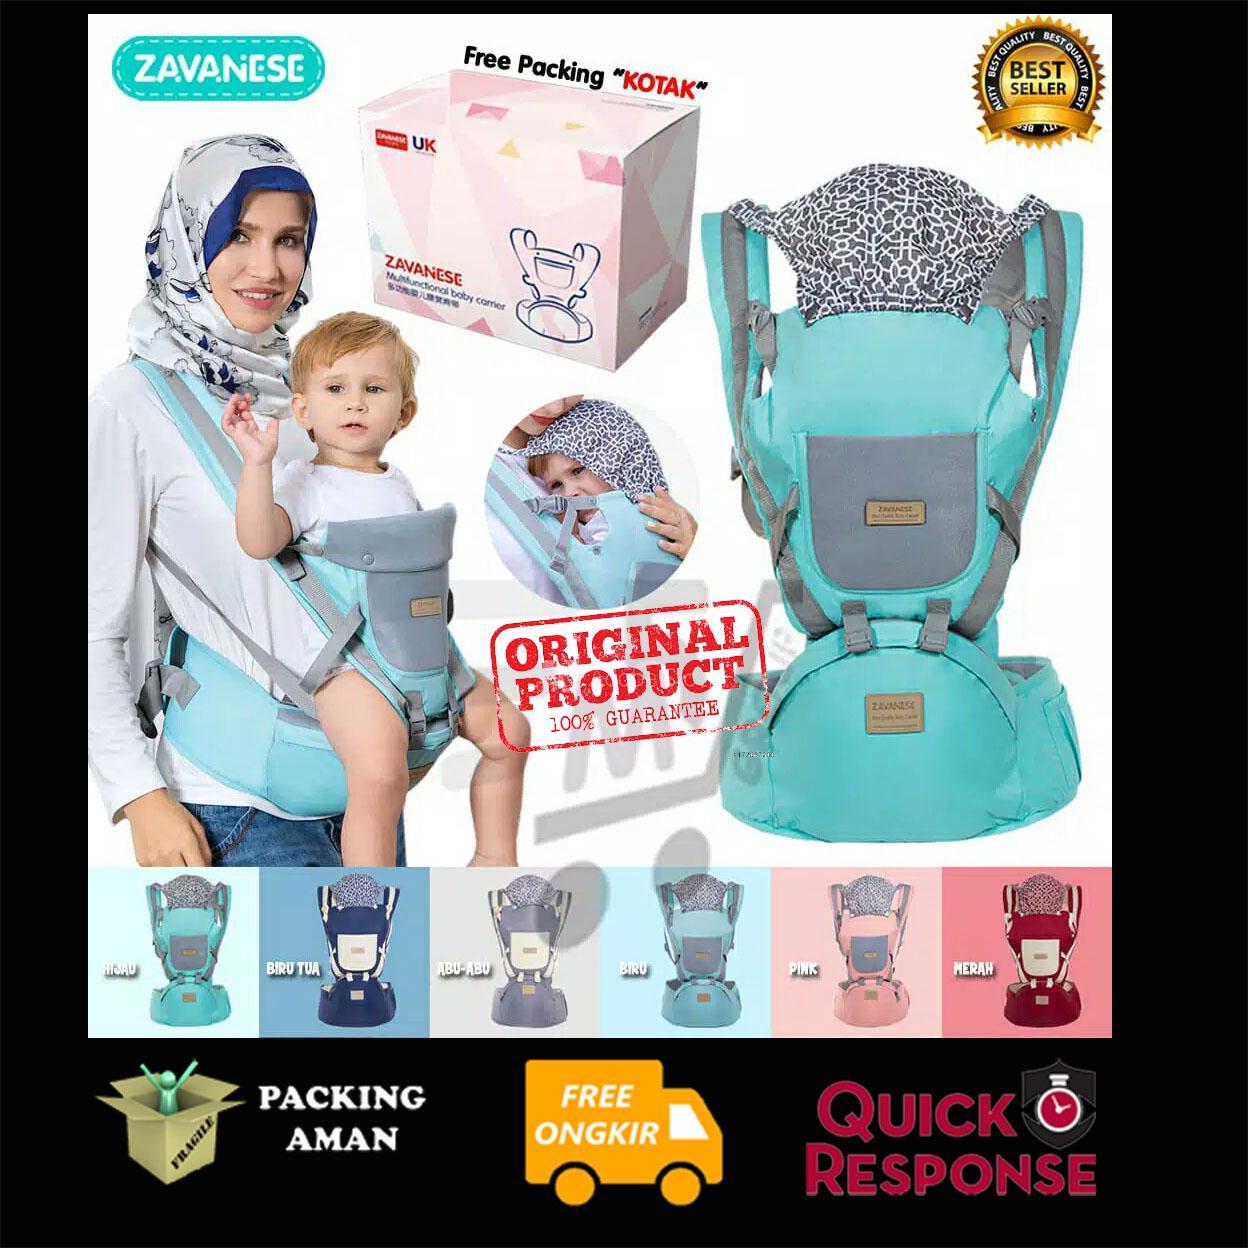 {produk Ori} Cahaya Amanah Gendongan Bayi Hipseat Zavanese Kupluk Hoodie Gendongan Anak Baby Carrier By Cahaya Amanah Kids Store.